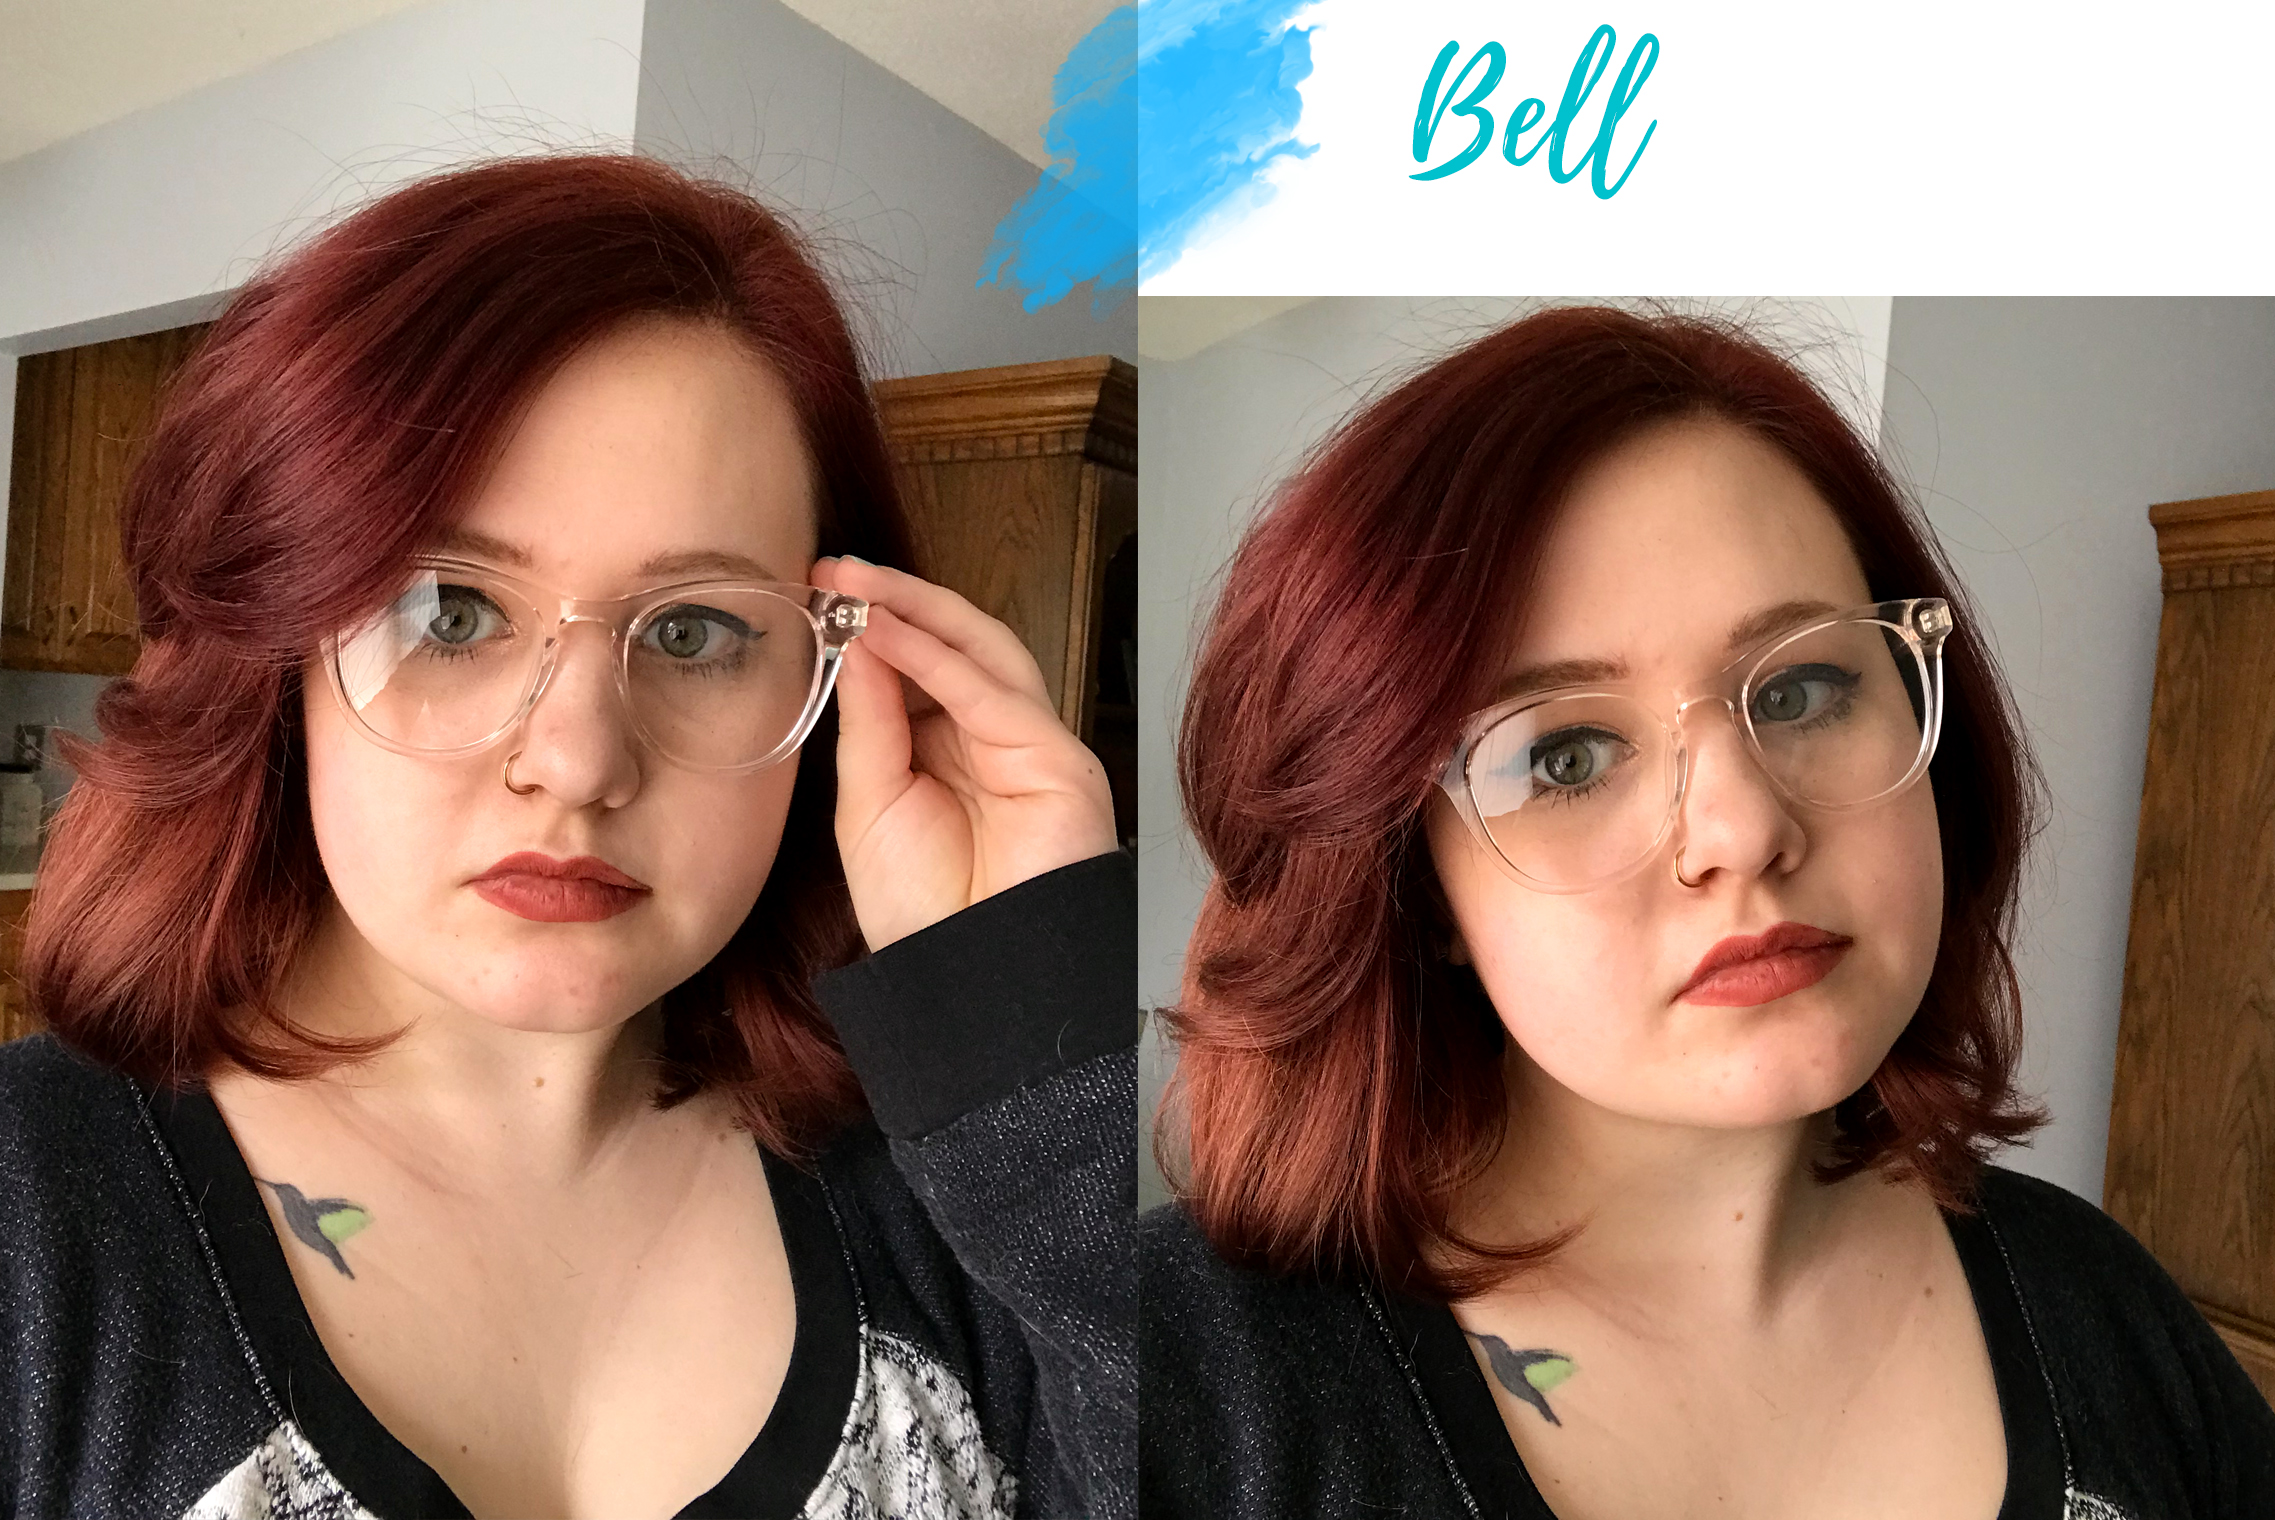 Warby Parker Bell glasses